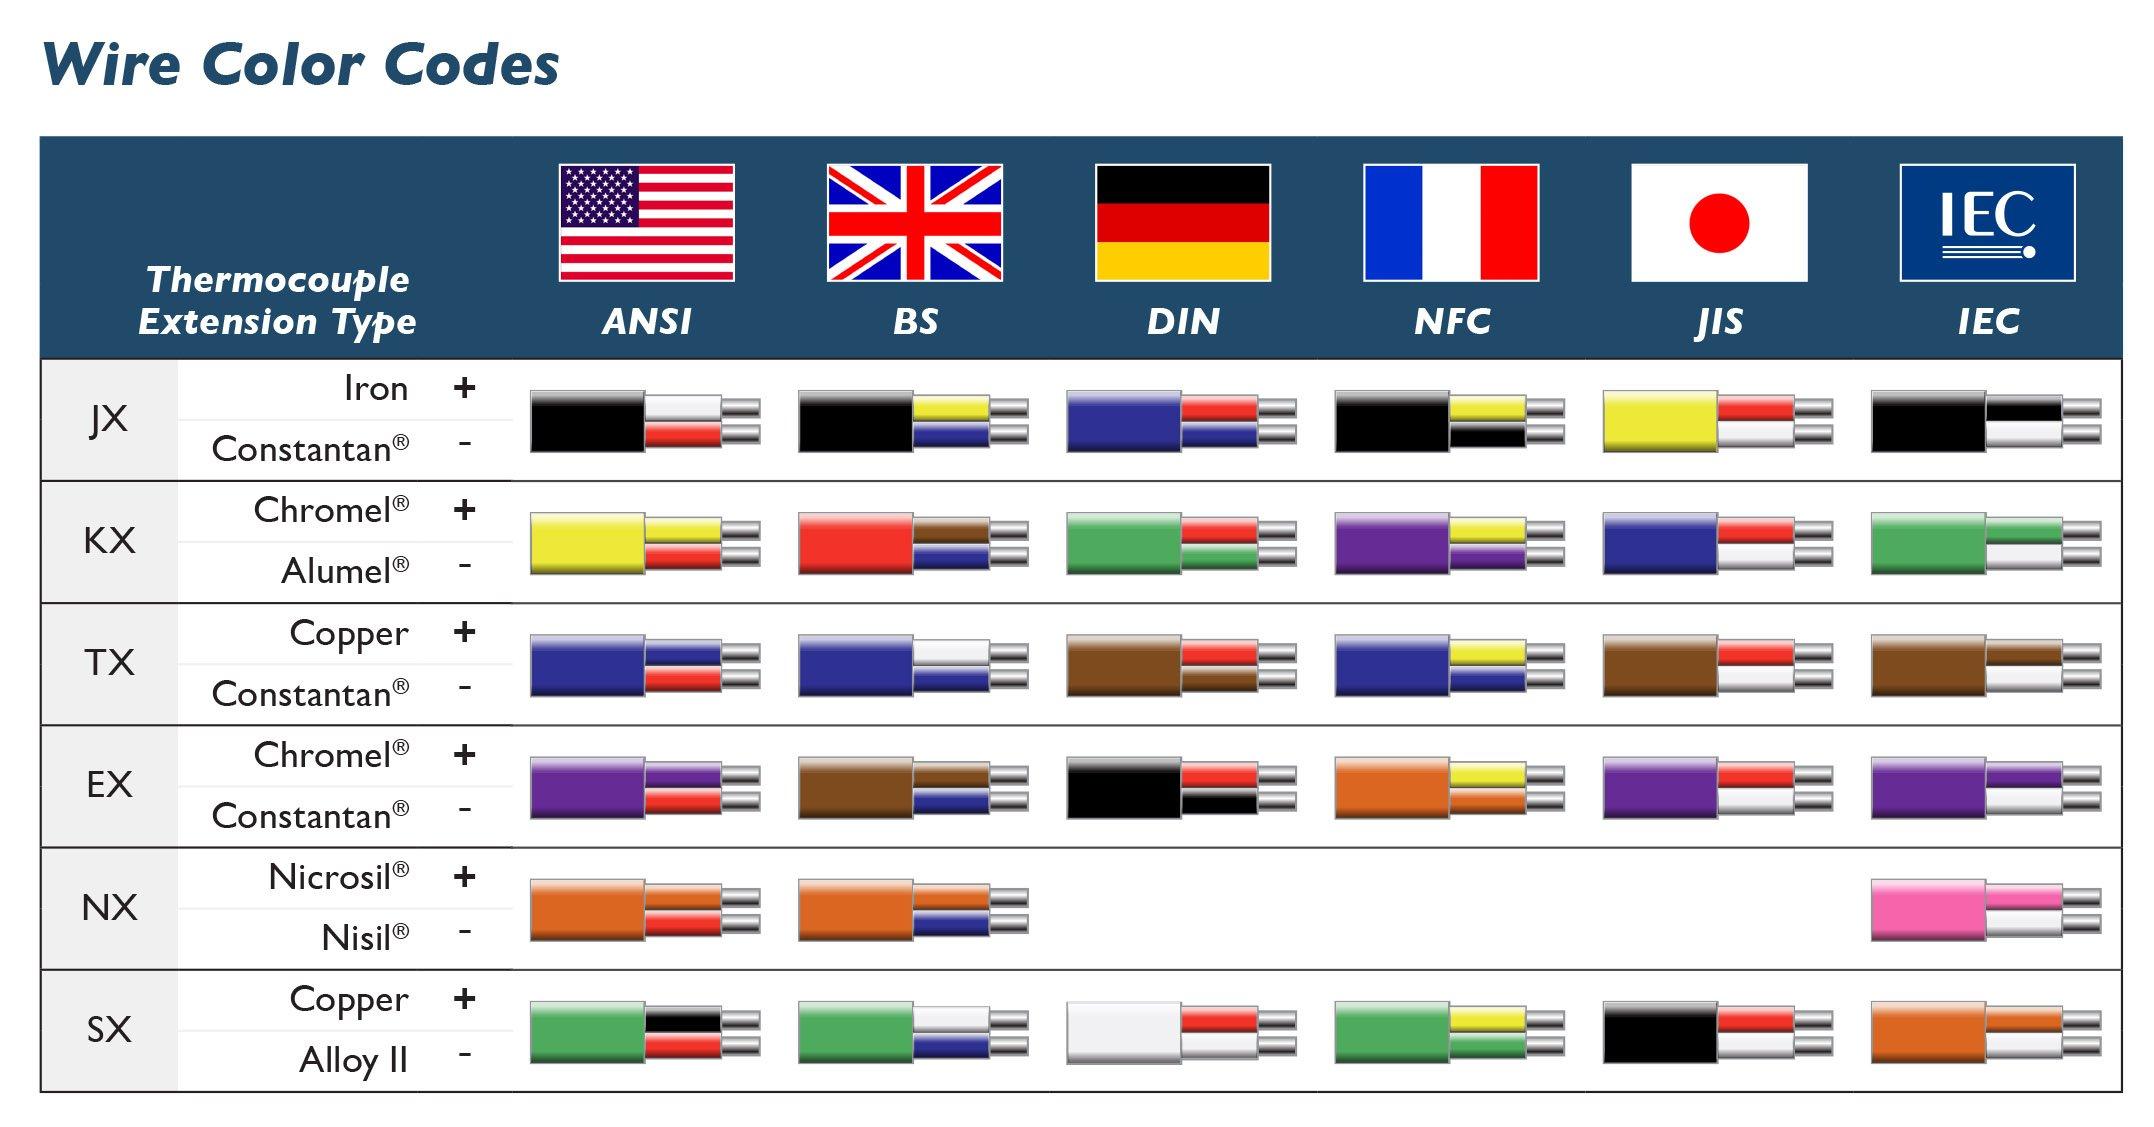 Dc Wiring Code Online Schematics Diagrams Seriel Kohler Diagram Engine Loq0467j0394 Color Standards Detailed Schematic Rh 4rmotorsports Com Colour Codes